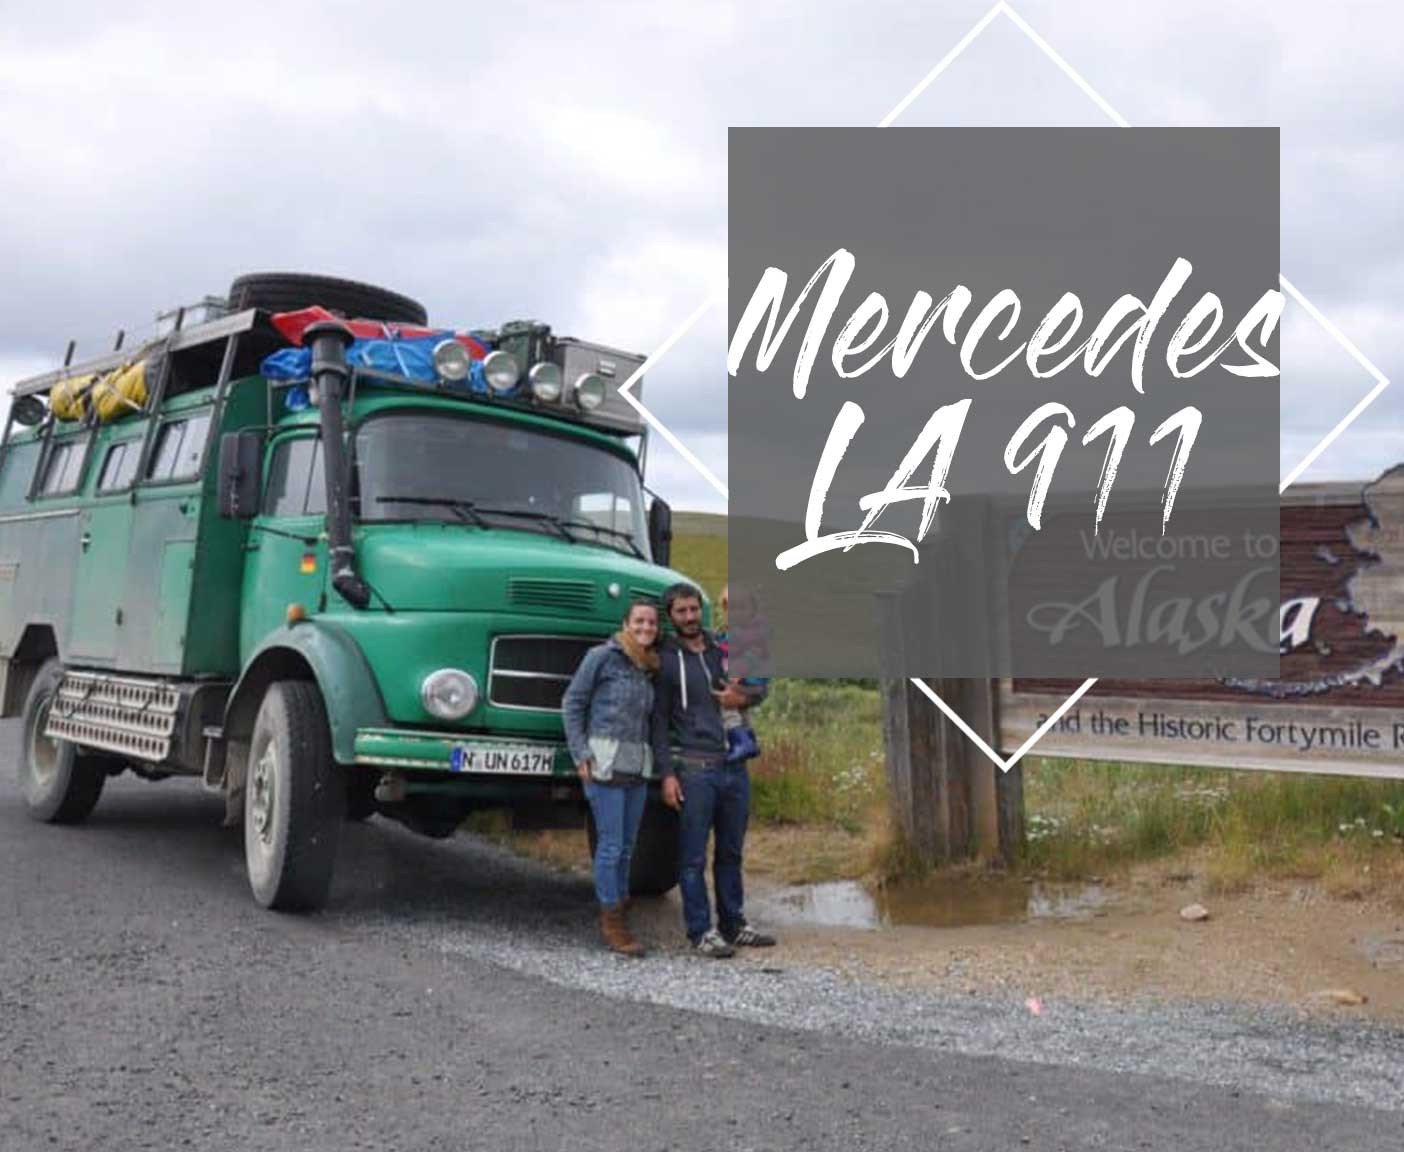 mercedes-LA-911-B-hippie-trail-kurzhauber-4x4-wohnmobil-panamericana-alaska-camper